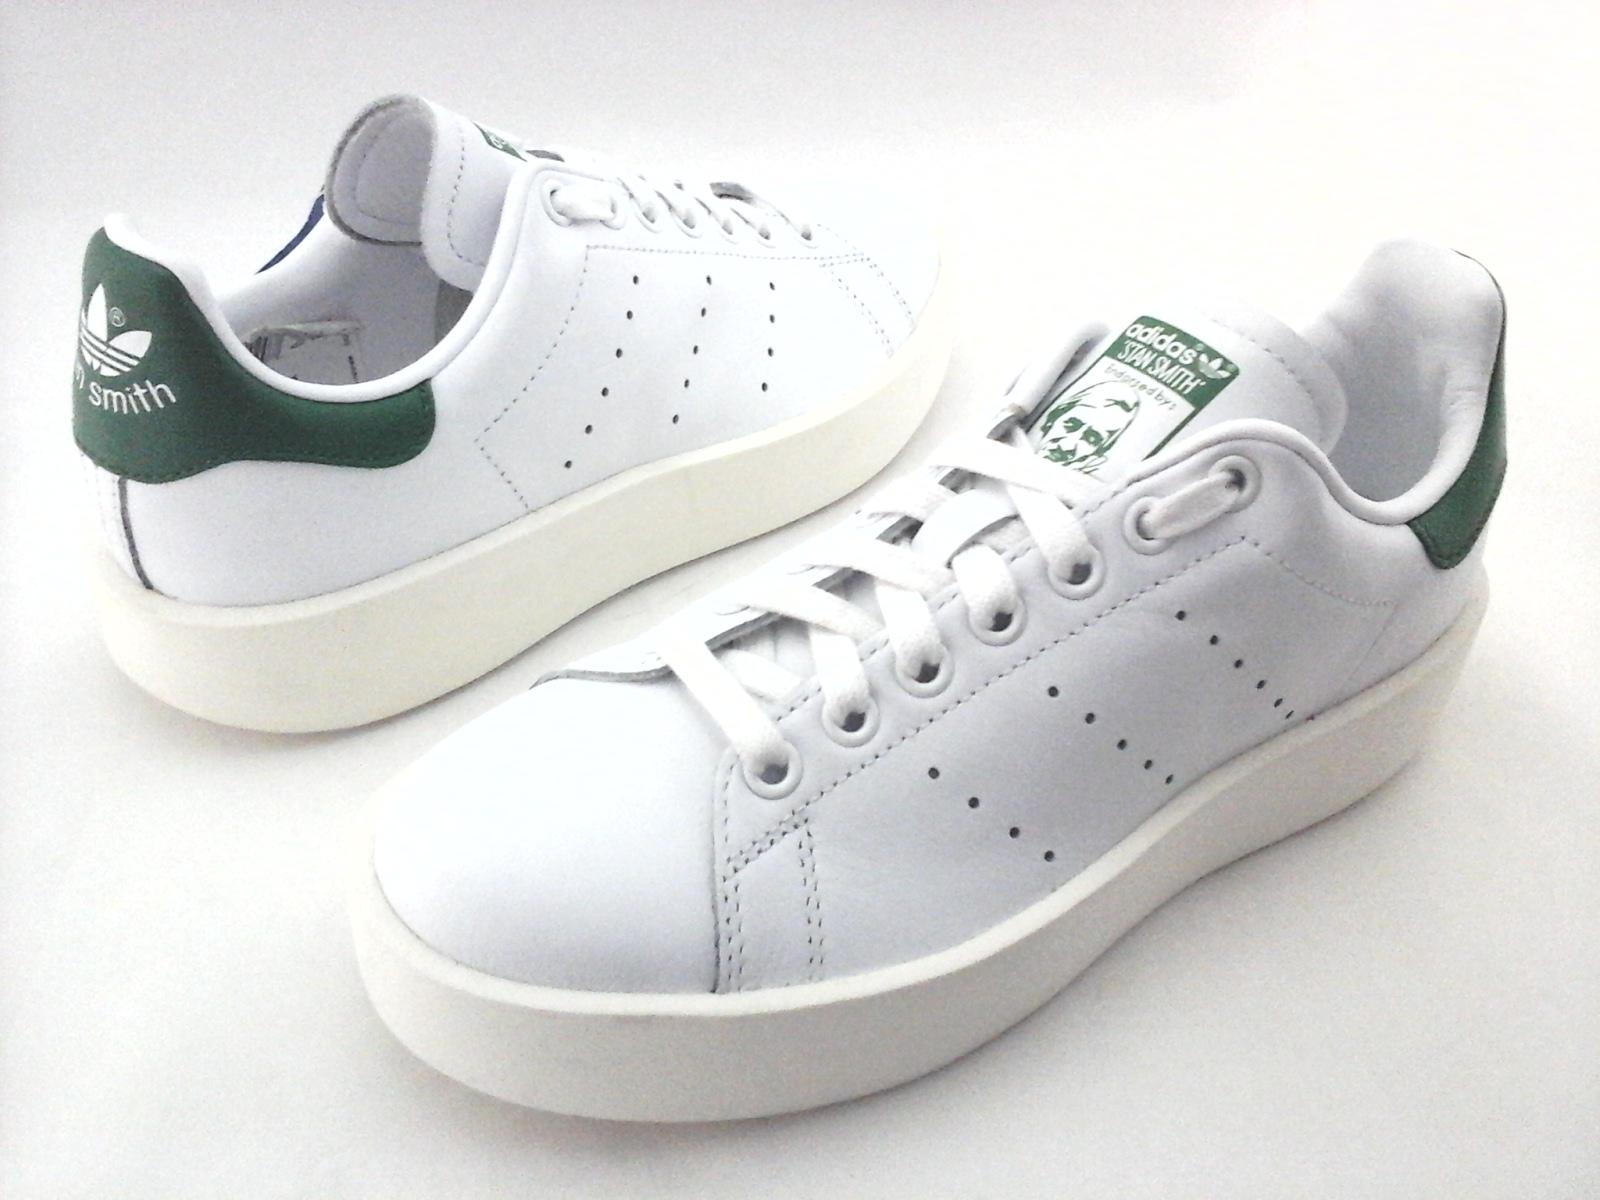 7fdd0411c4b3 ADIDAS Stan Smith Platform Bold Shoes White Green S32266 Women s US 6.5 EU  38